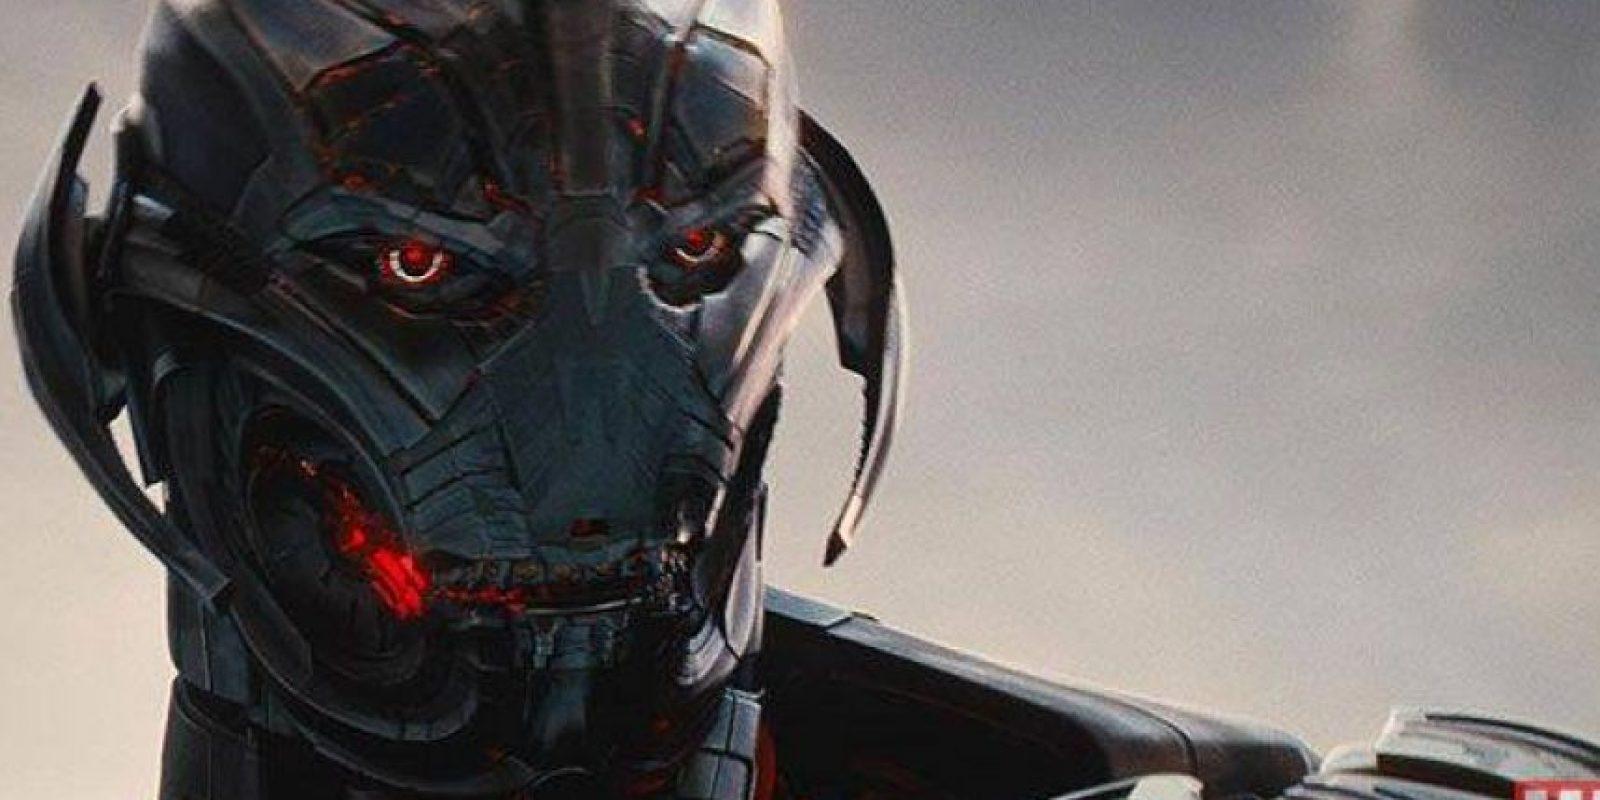 Ultron Foto:Facebook/avengers